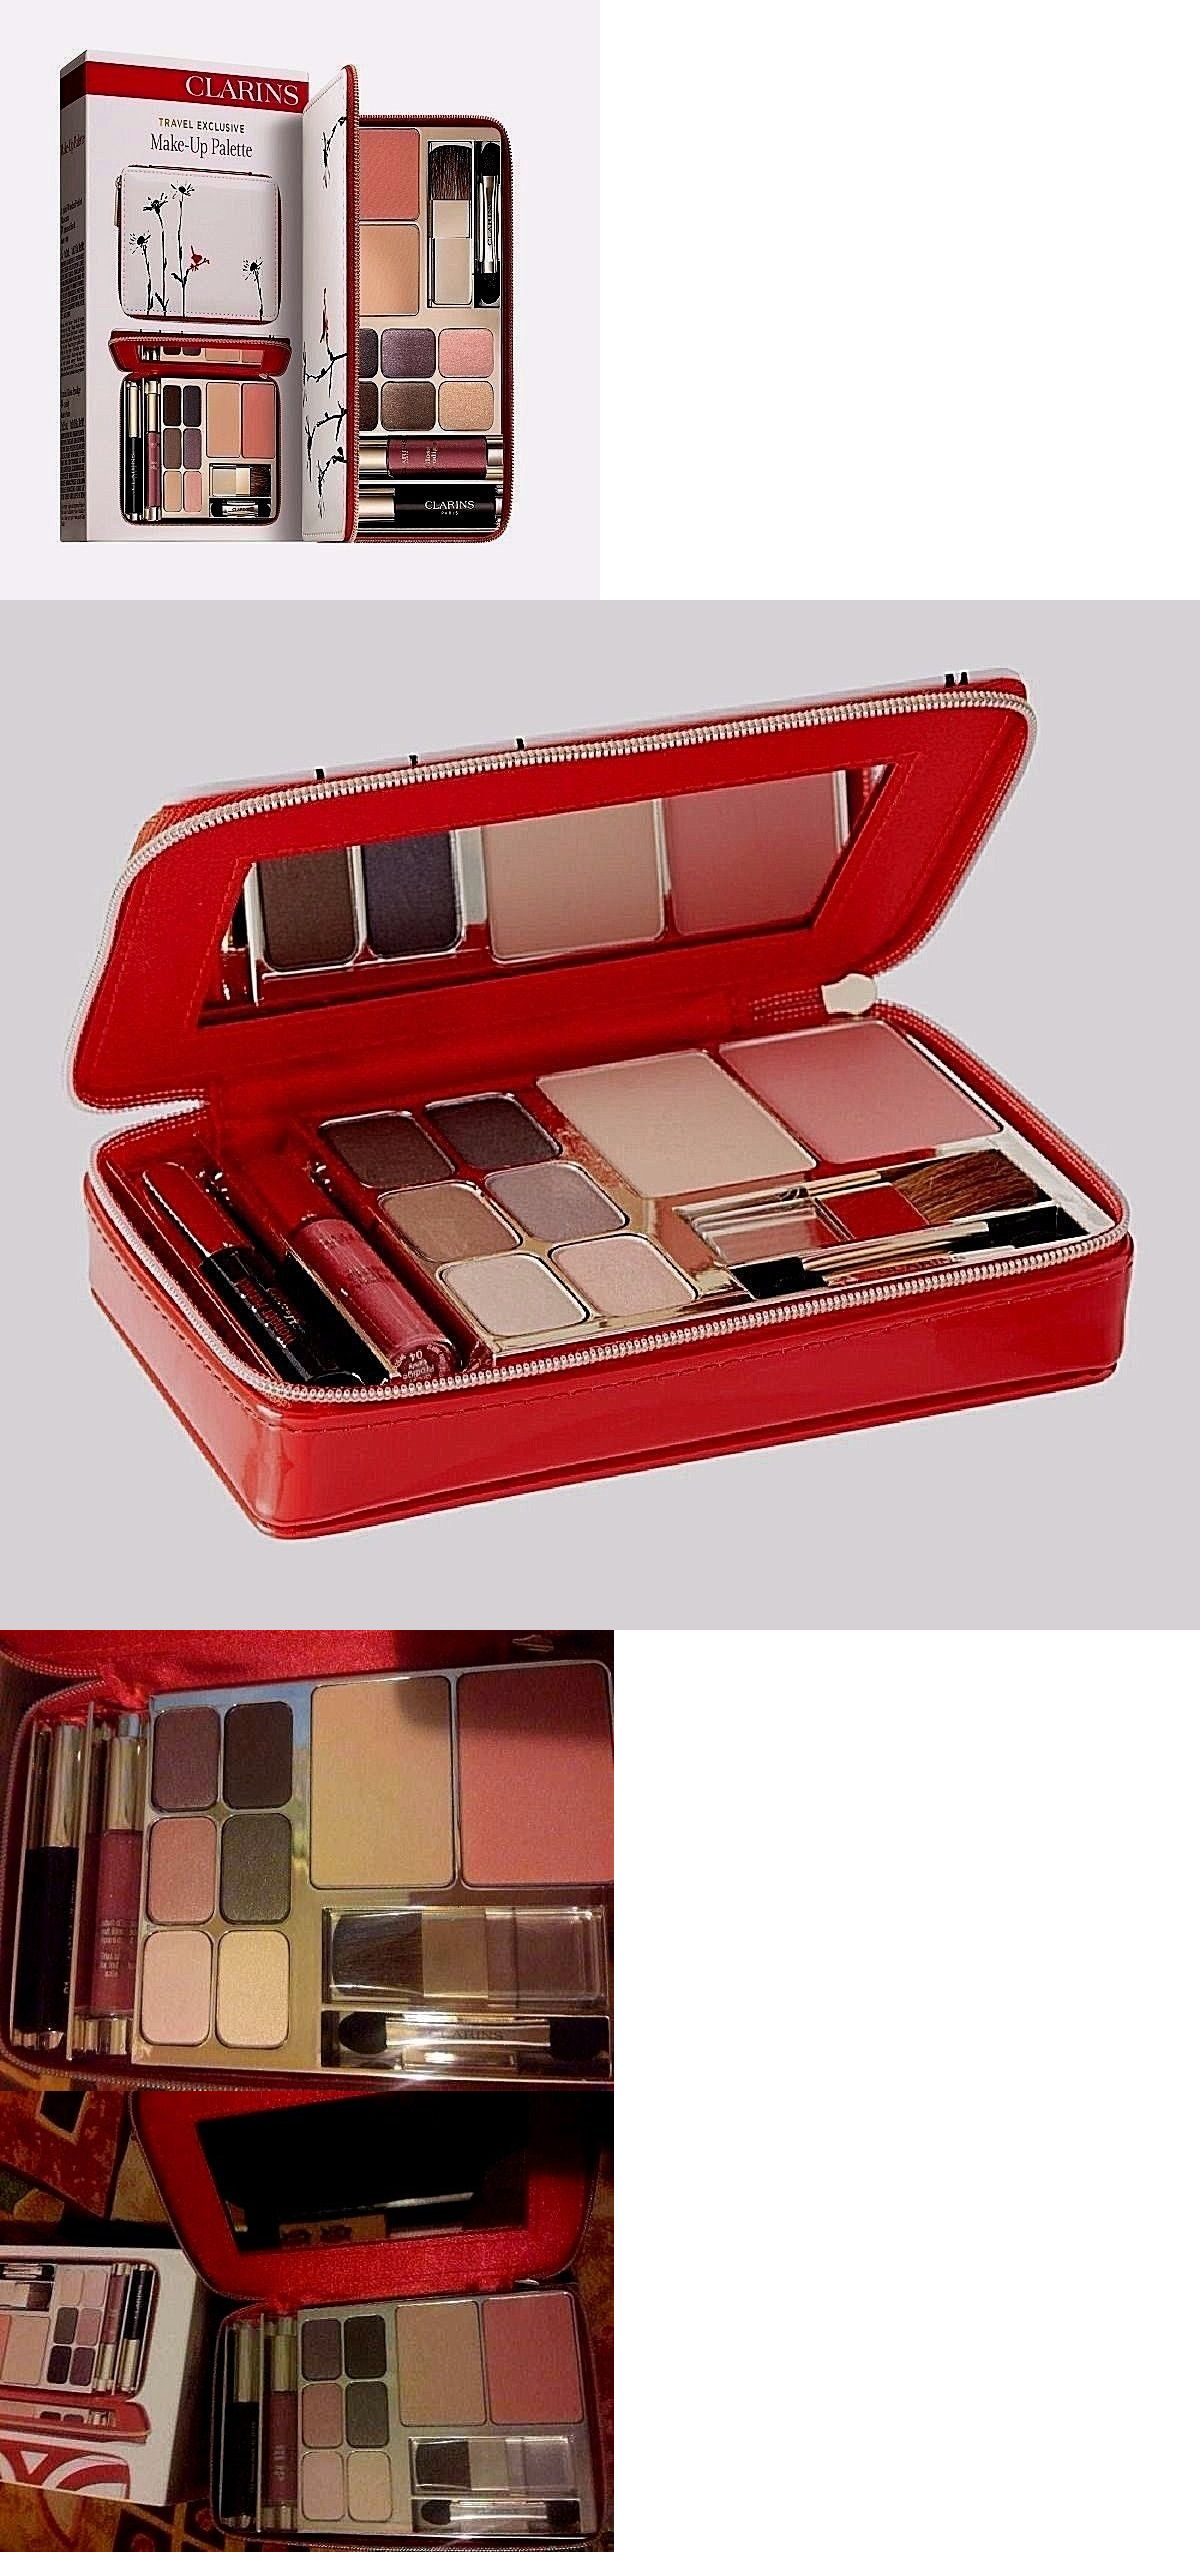 Makeup Sets and Kits Clarins Travel Exclusive Makeup